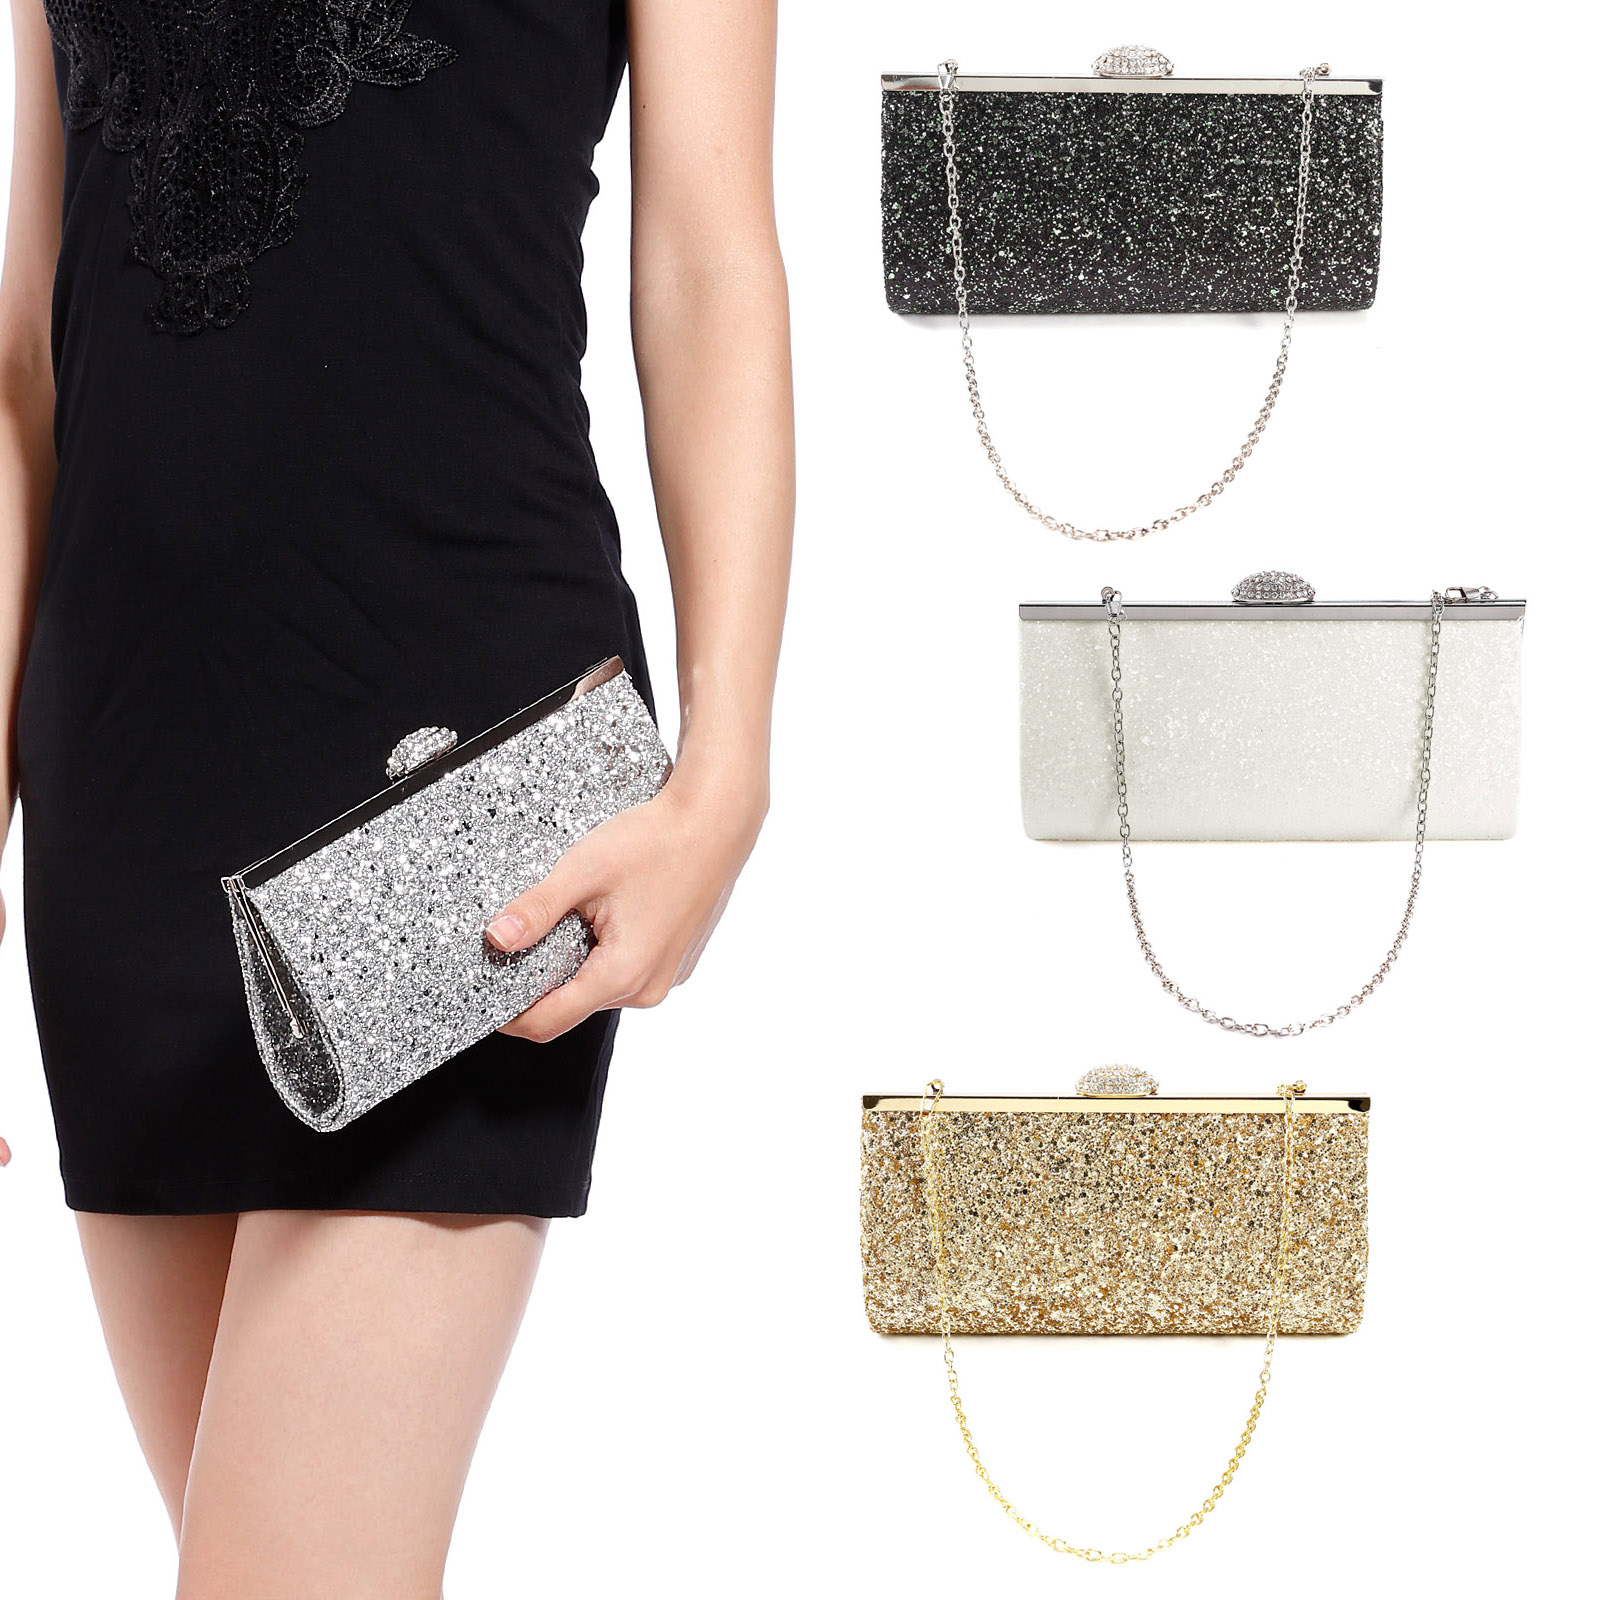 Ladies Evening Clutch Bag// Bridal Party Purse Handbag Sparkle Glitter For Women